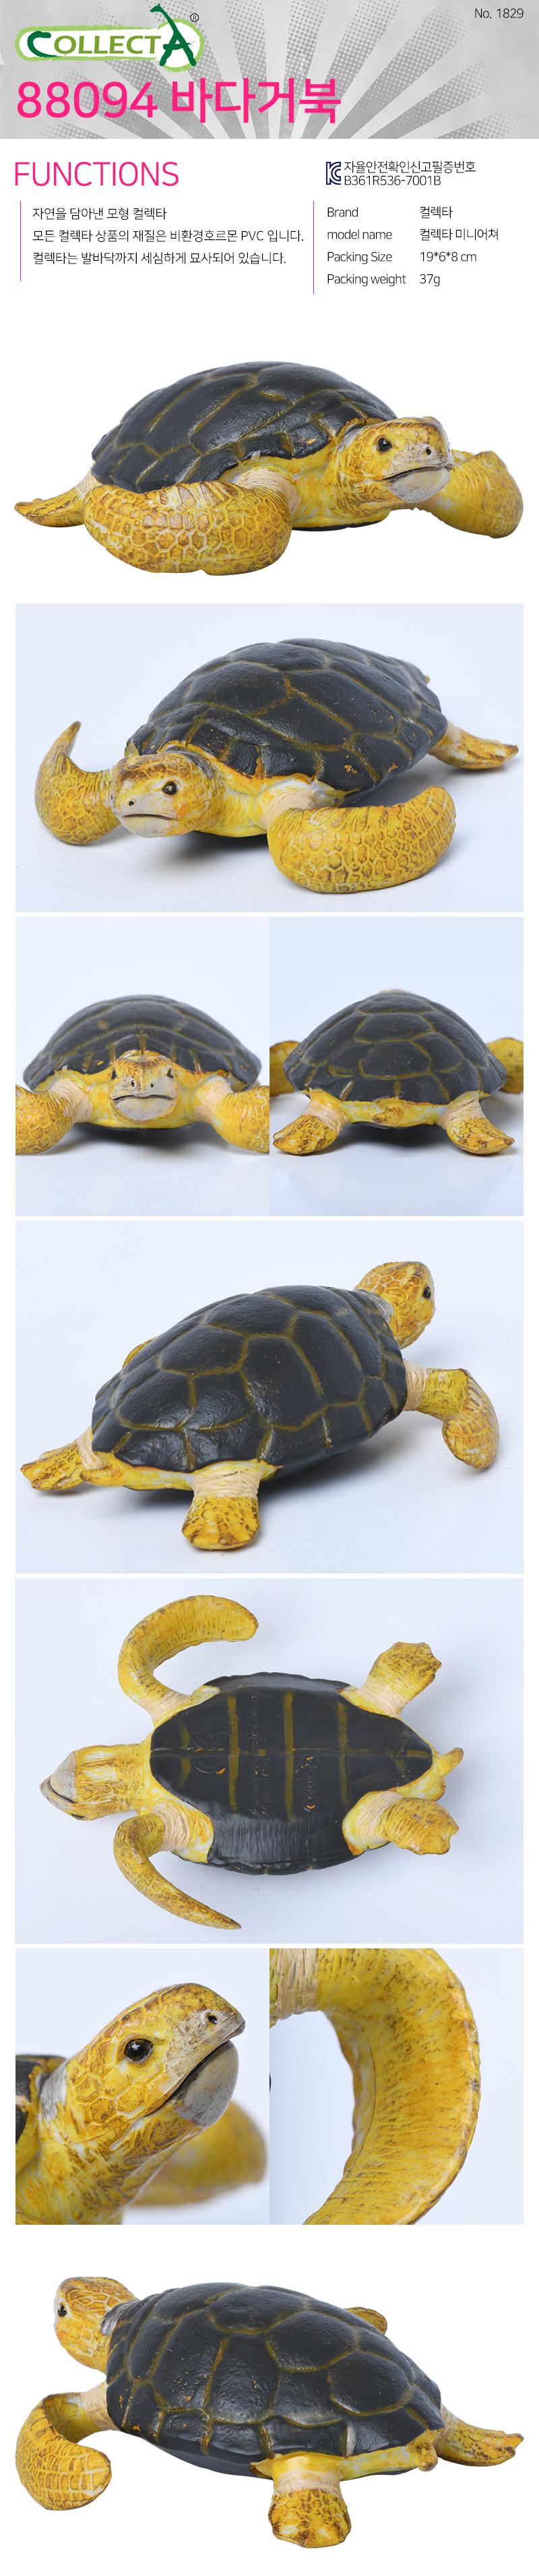 NEW CollectA 88094 Loggerhead Sea Ocean Turtle Model